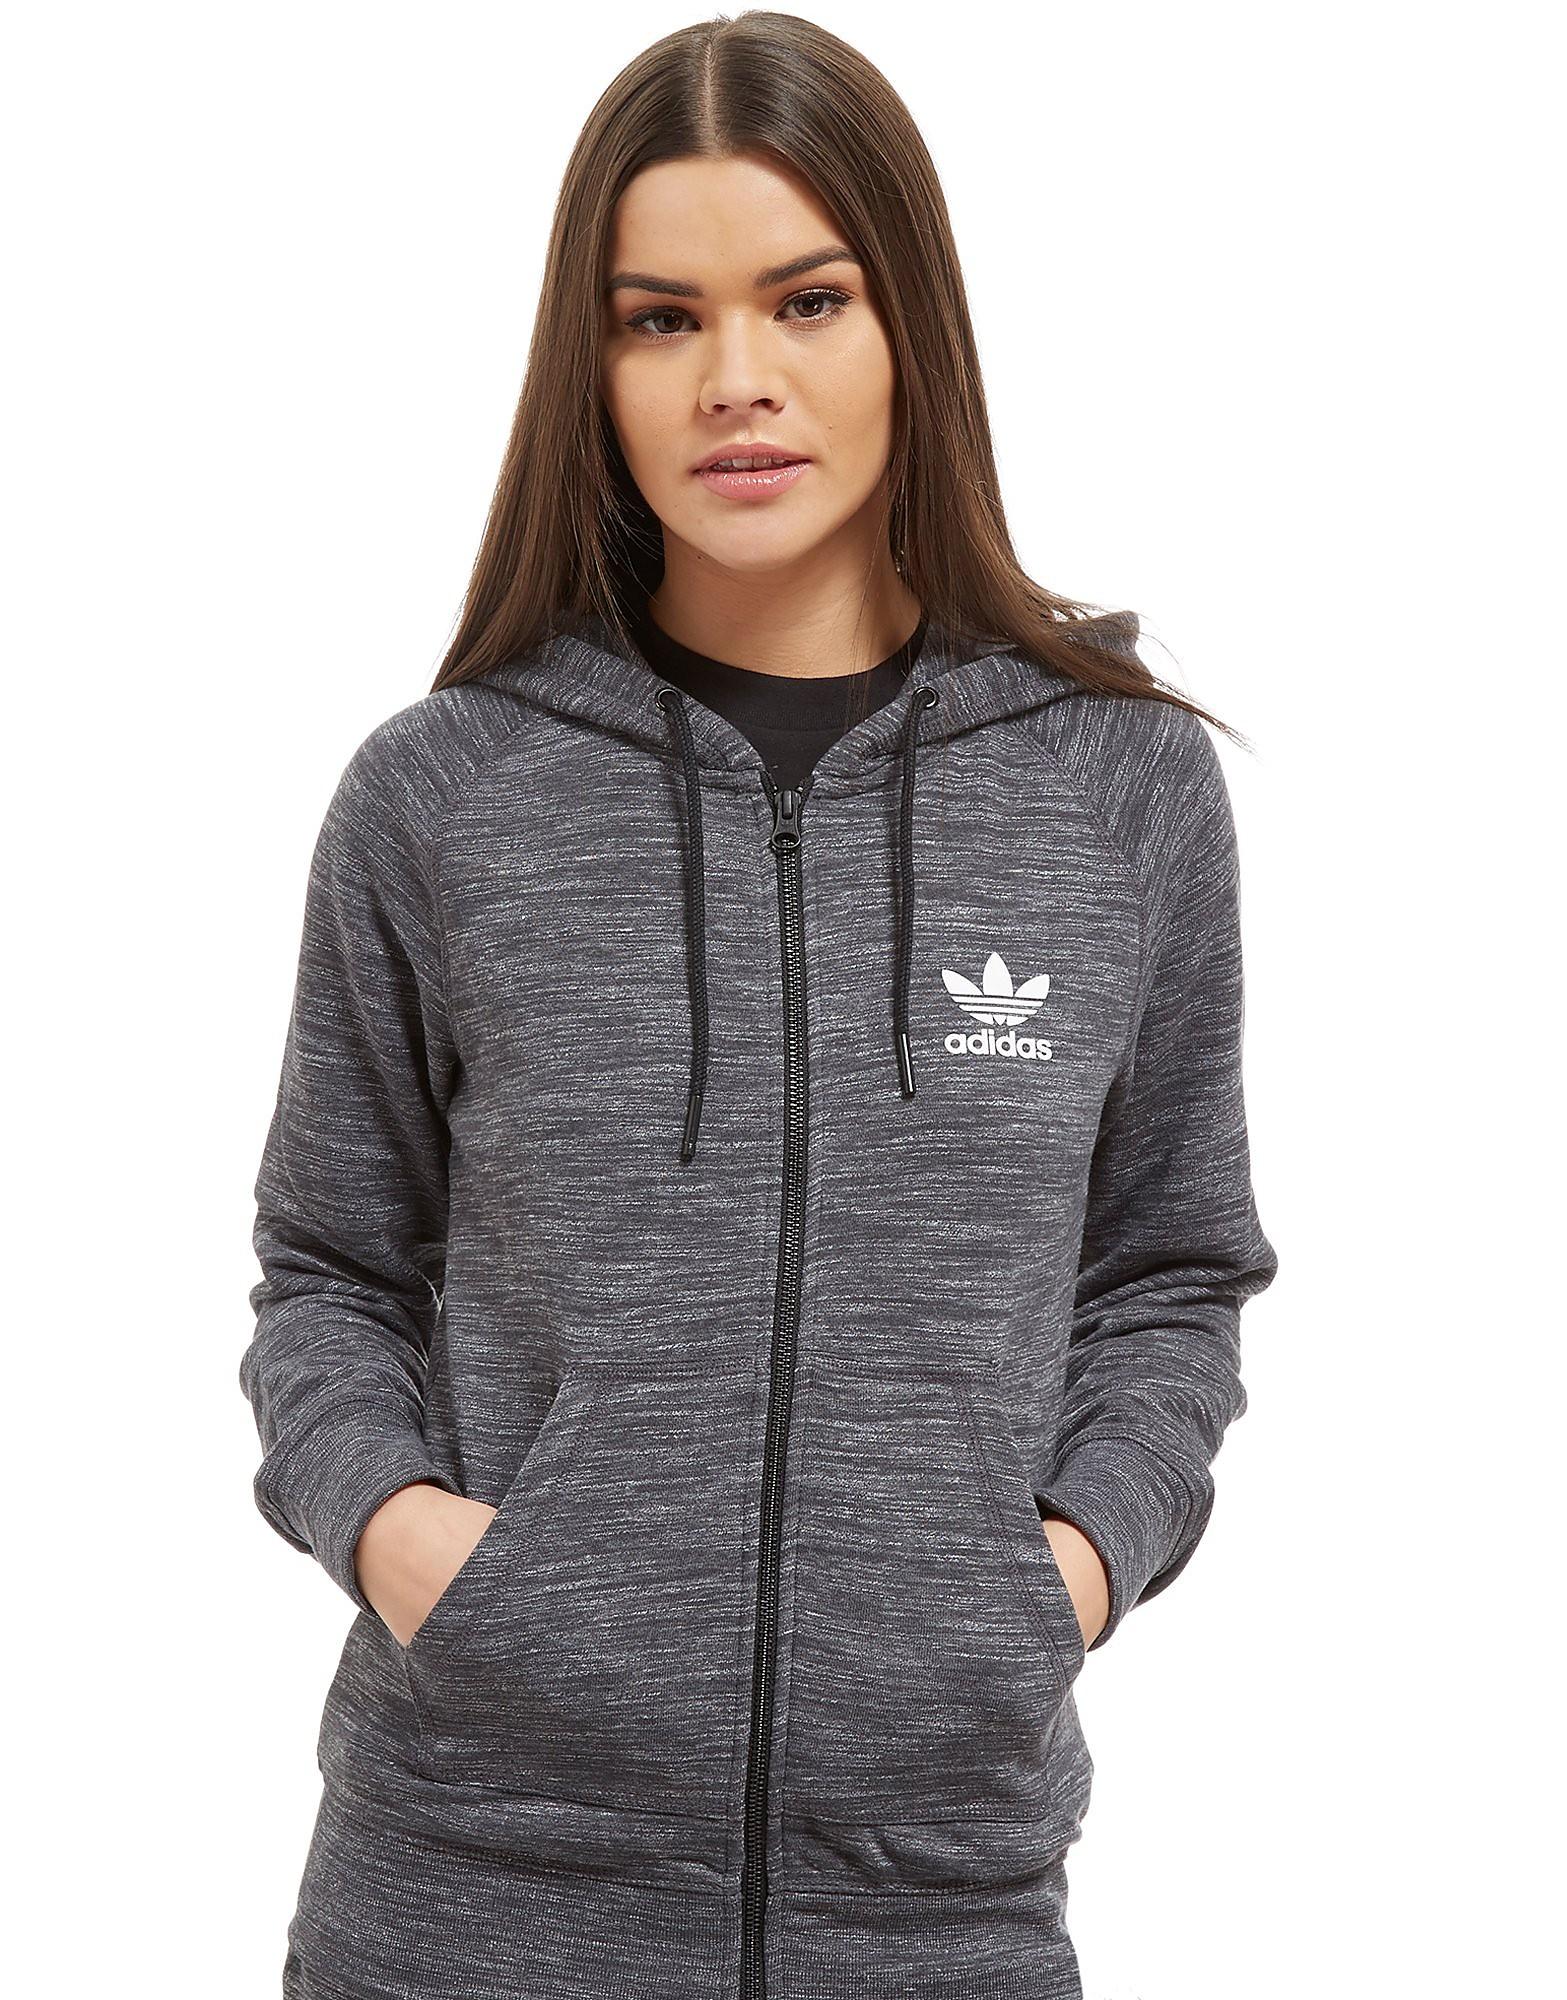 adidas Originals Premium Spacedye Full Zip Hoodie